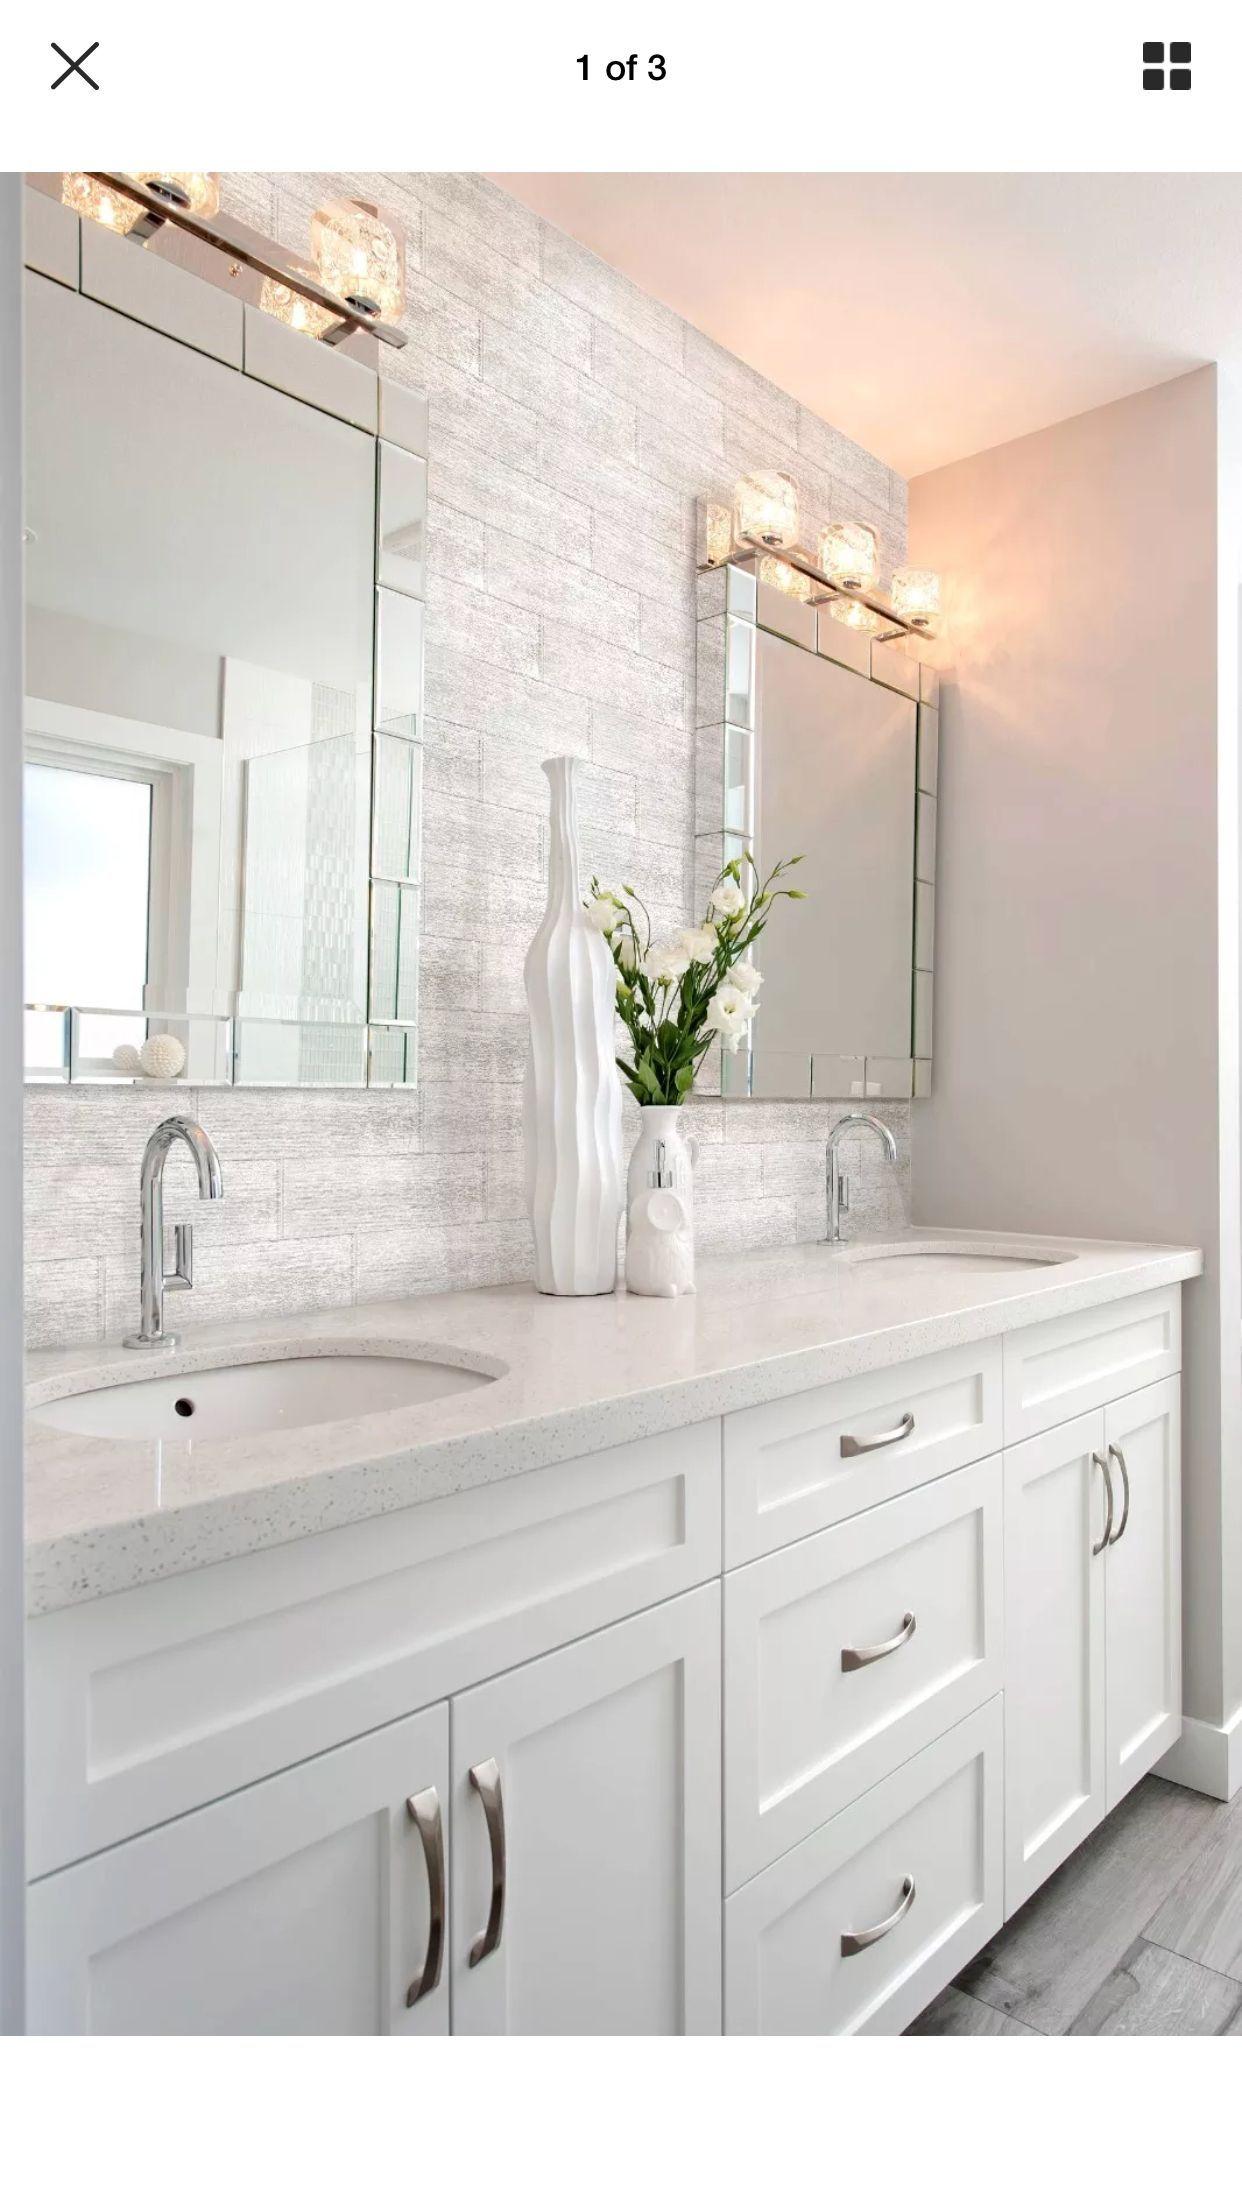 top 10 double bathroom vanity design ideas in 2019 on vanity bathroom id=90417